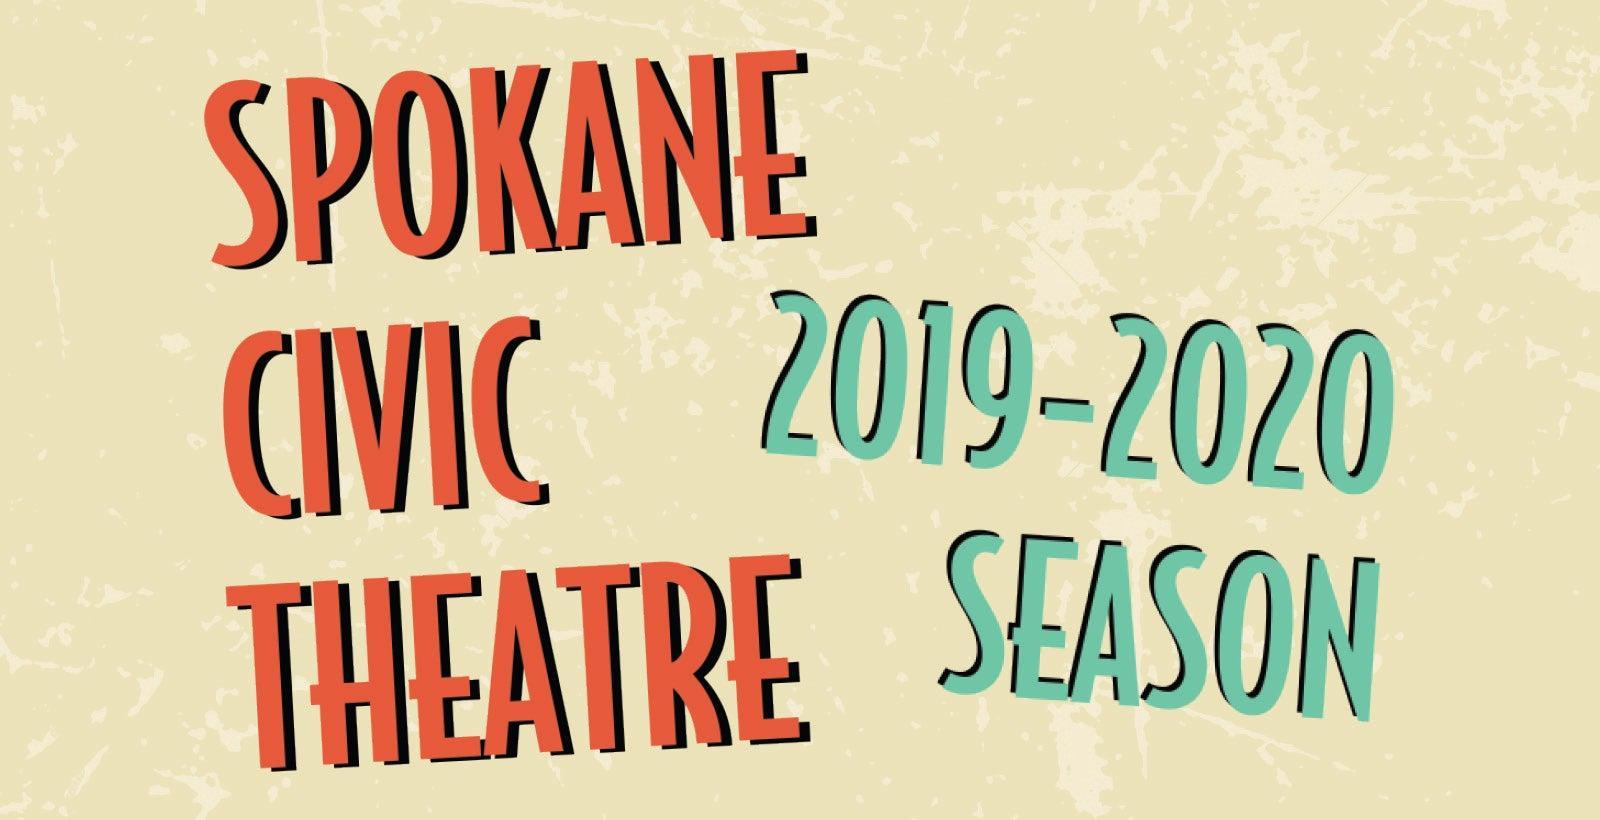 Spokane Civic Theater Firth J. Chew Studio Season Tickets - 2019-2020